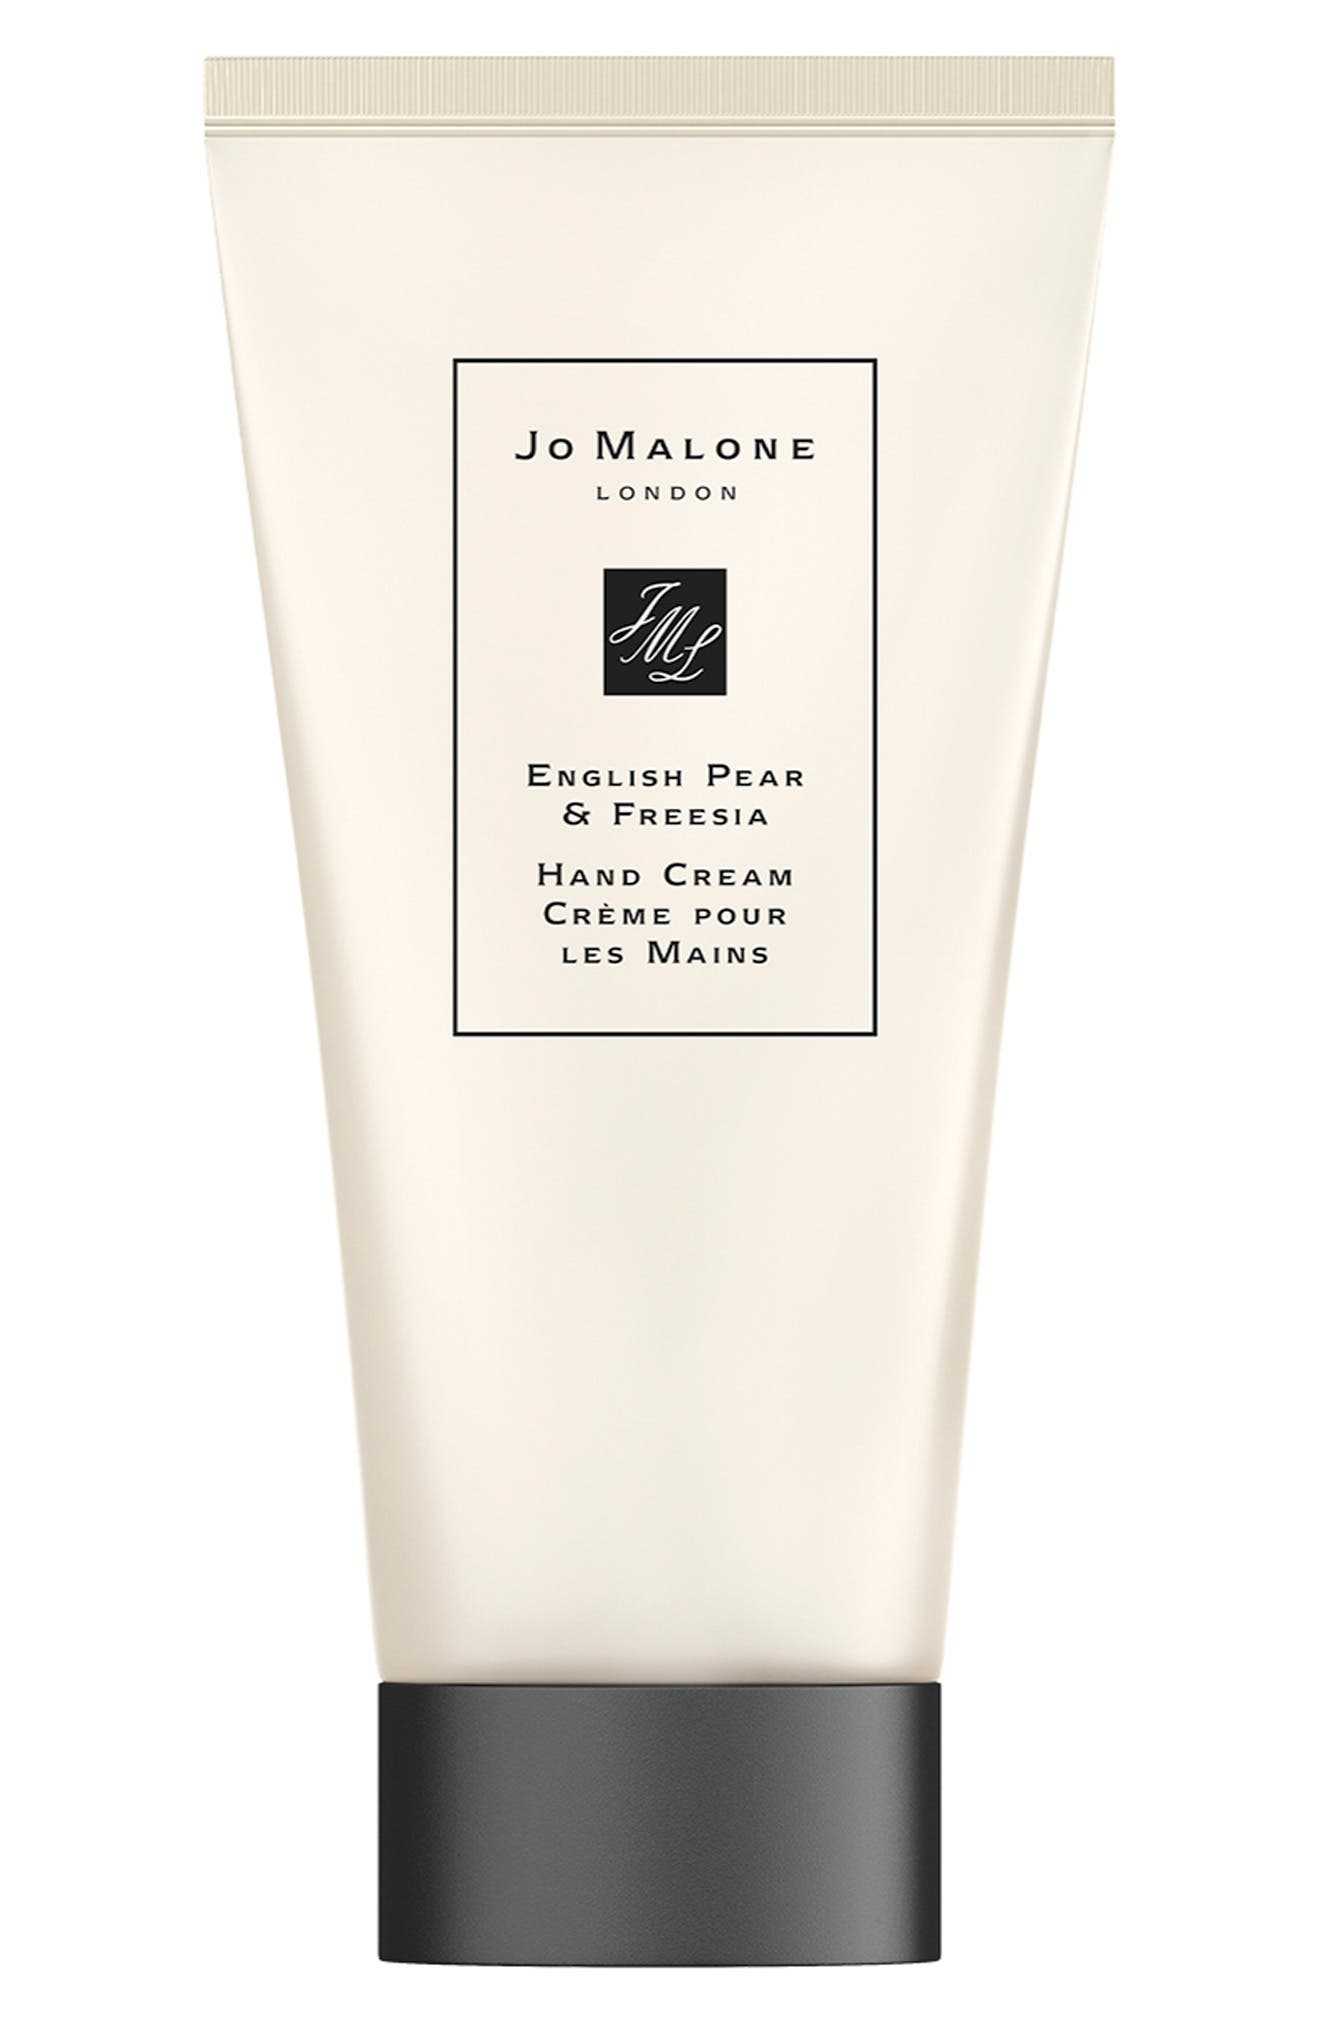 Jo Malone London(TM) English Pear & Freesia Hand Cream